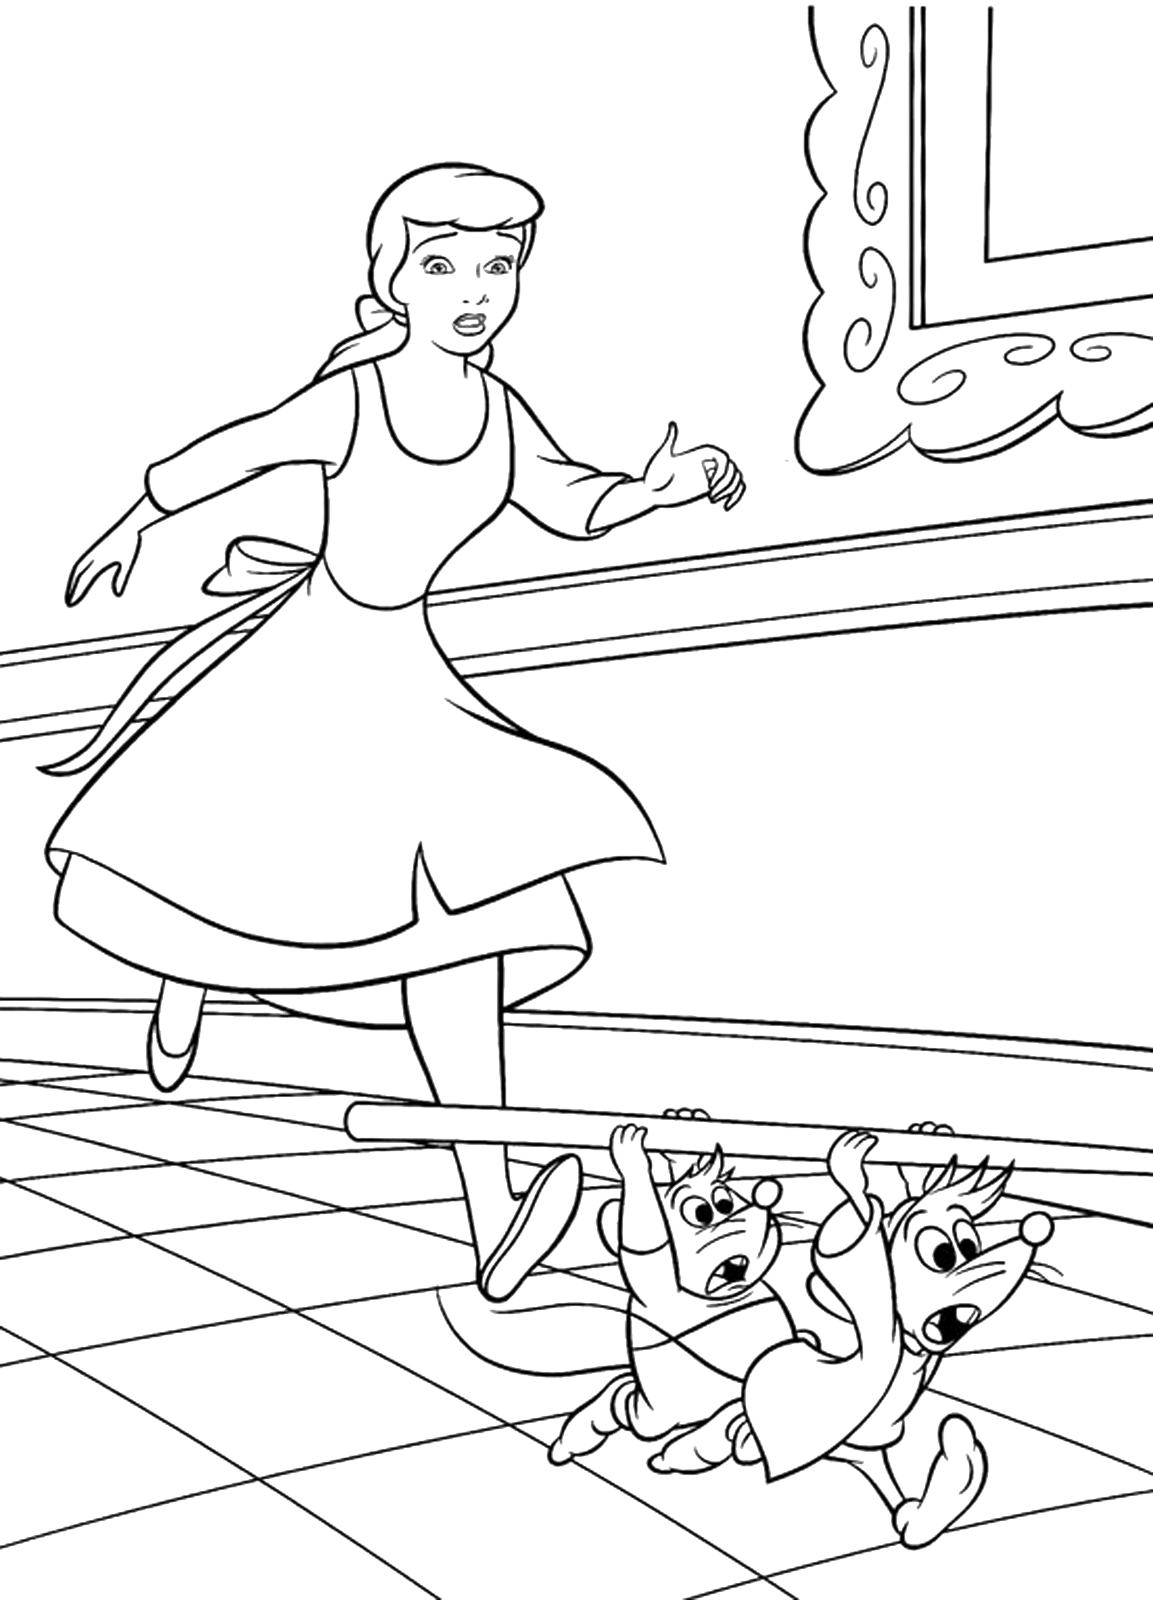 Cinderella - Cinderella runs behind Jaq and Gus the two mice